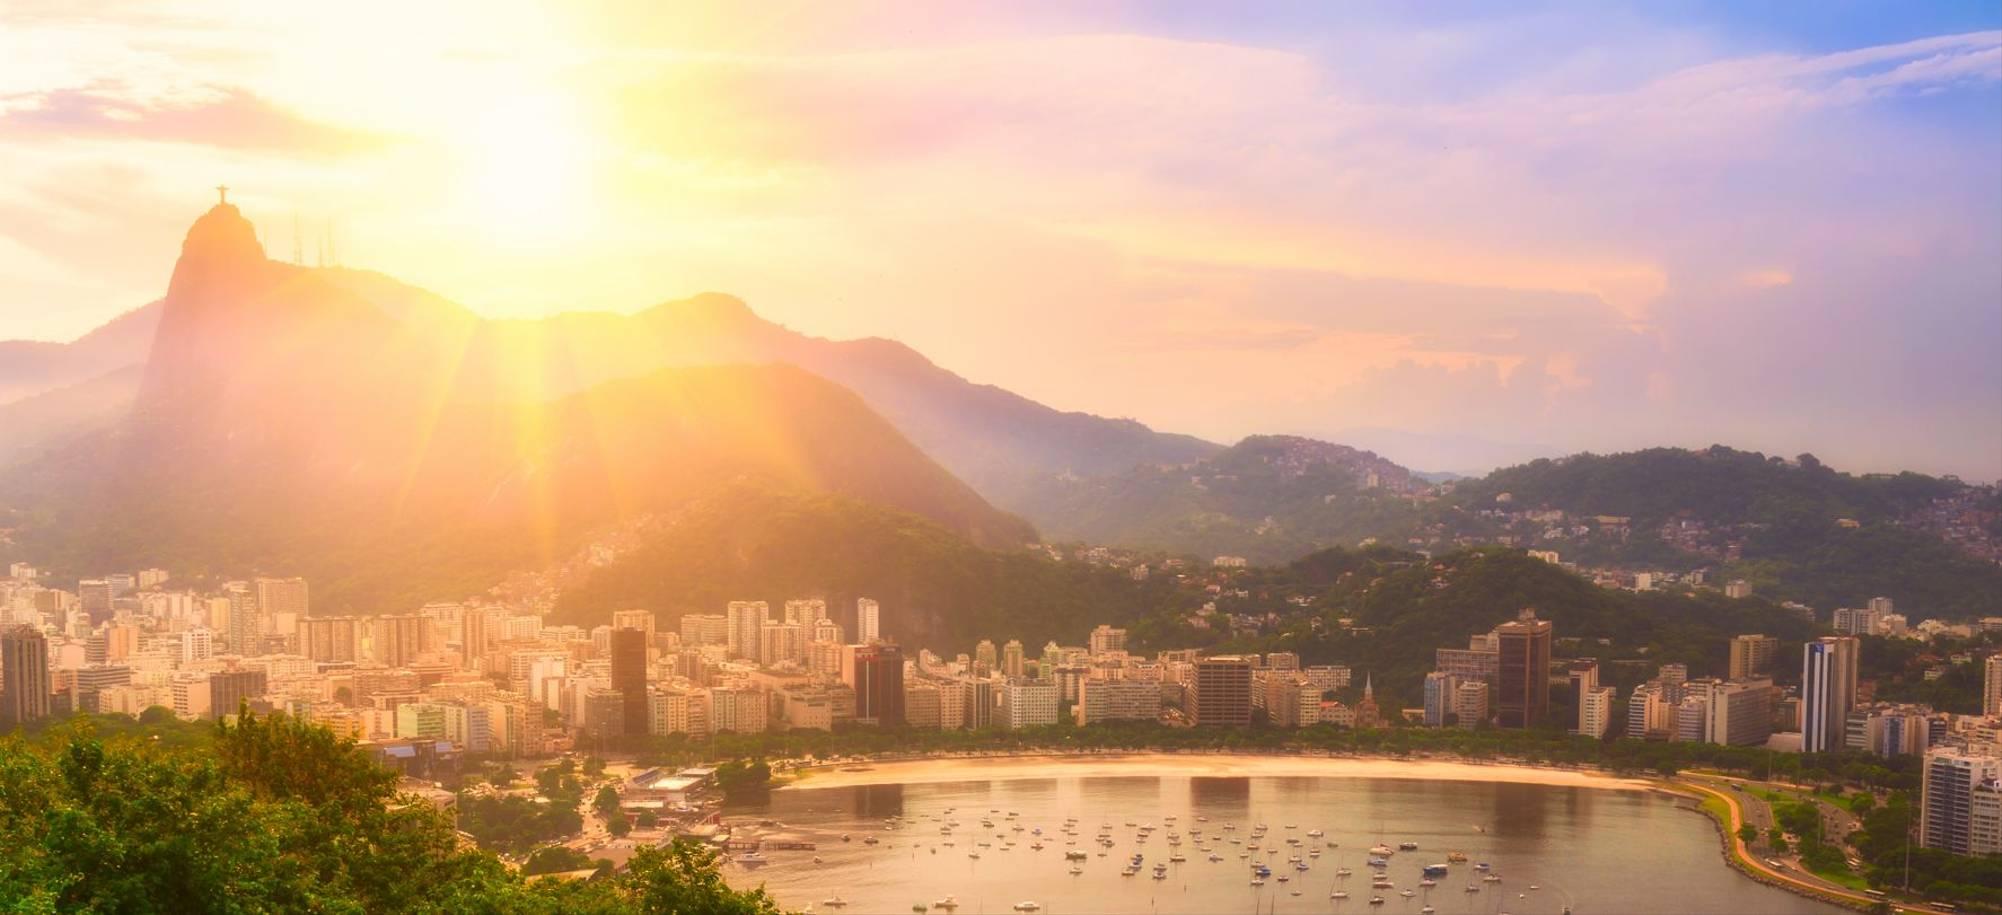 20 Day - Rio De Janeiro, Brazil - Itinerary Desktop.jpg